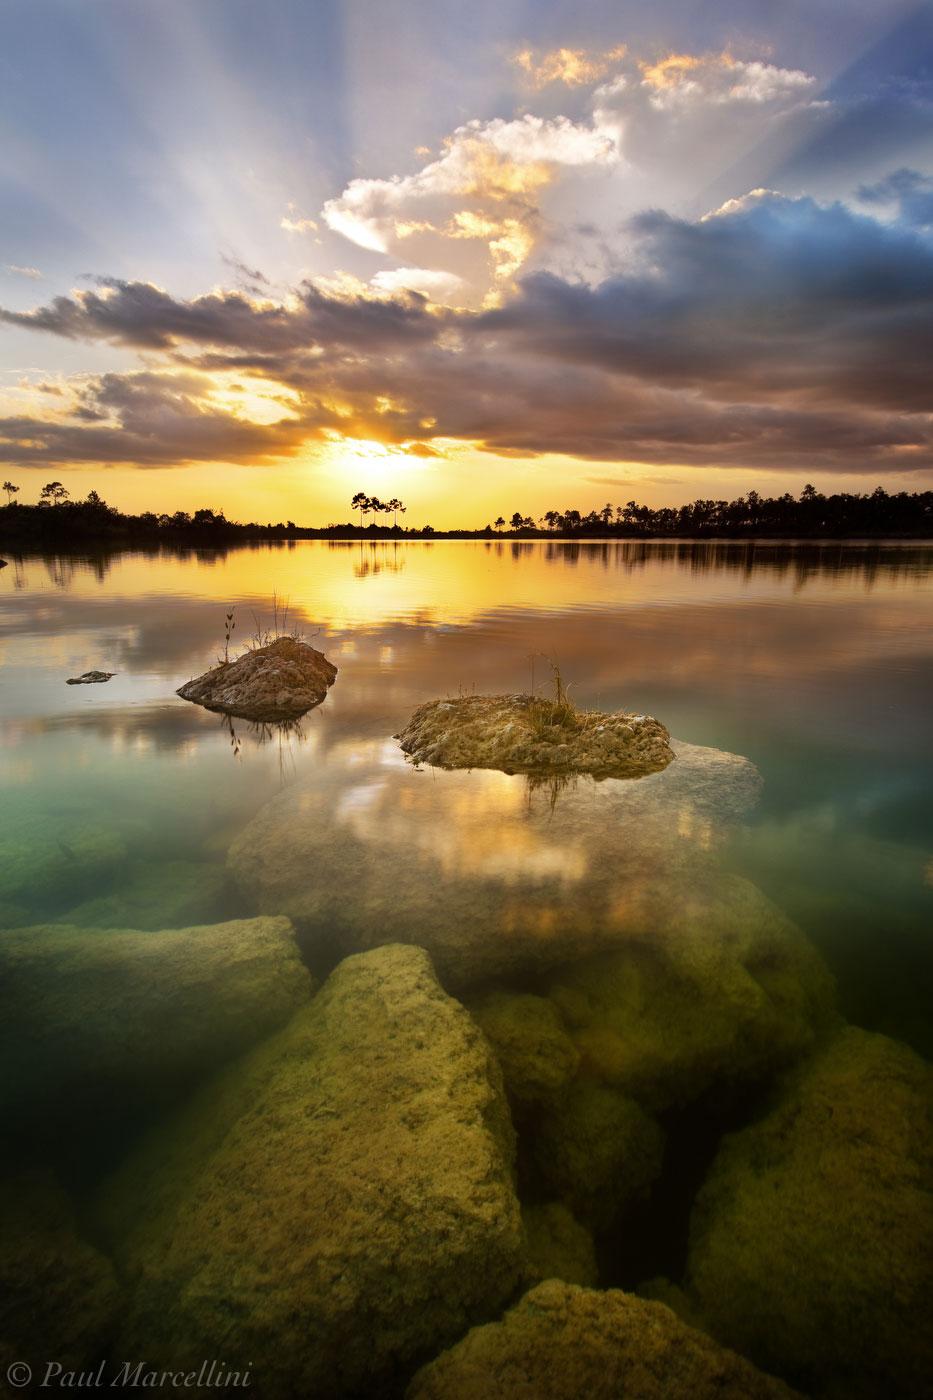 everglades, sunset, lake, pine, Florida, nature, photography, florida national parks, photo